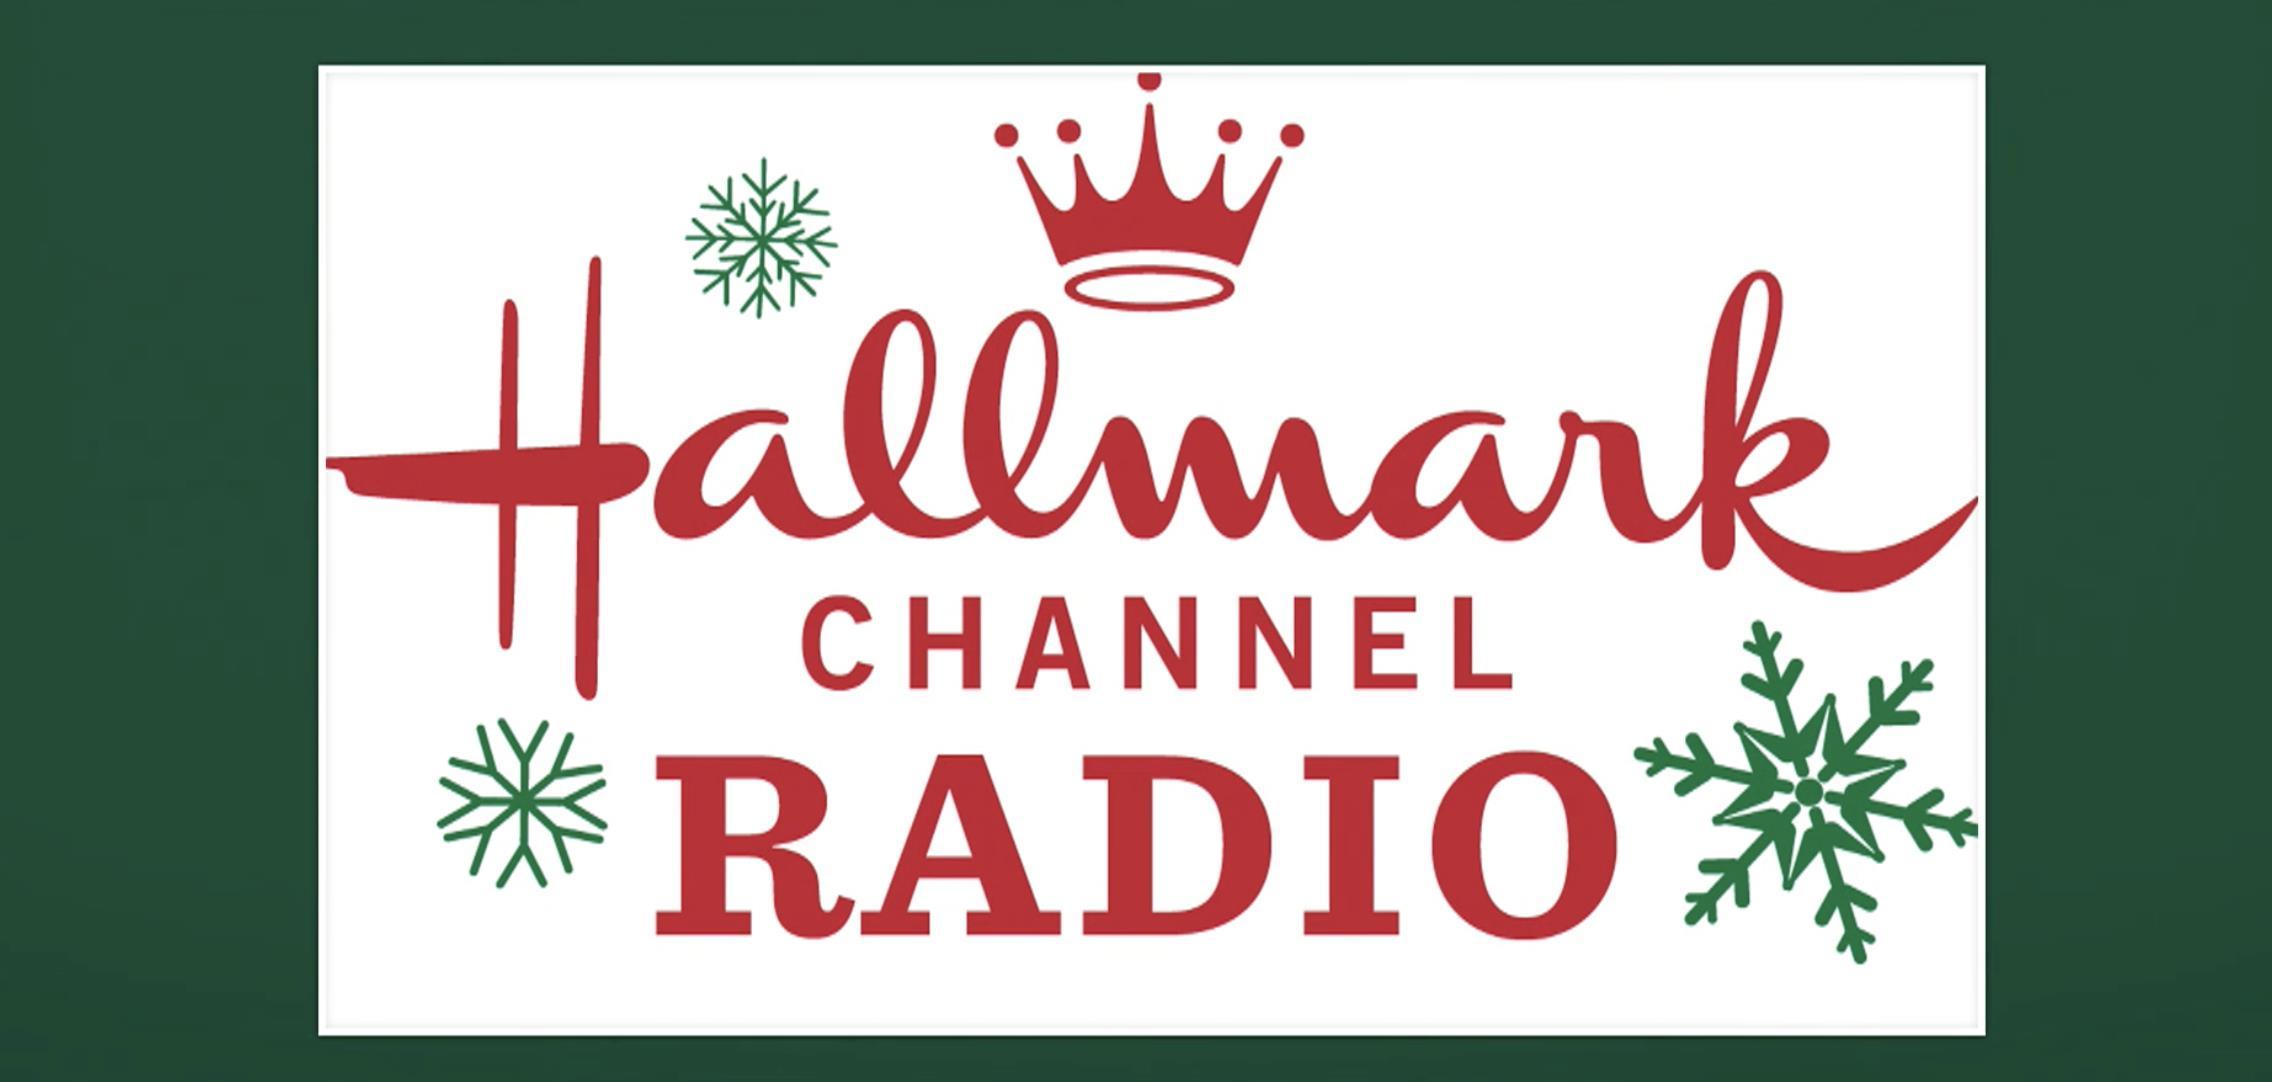 Siriusxm 2021 Christmas Stations Hallmark Channel Radio On Siriusxm Home Family Video